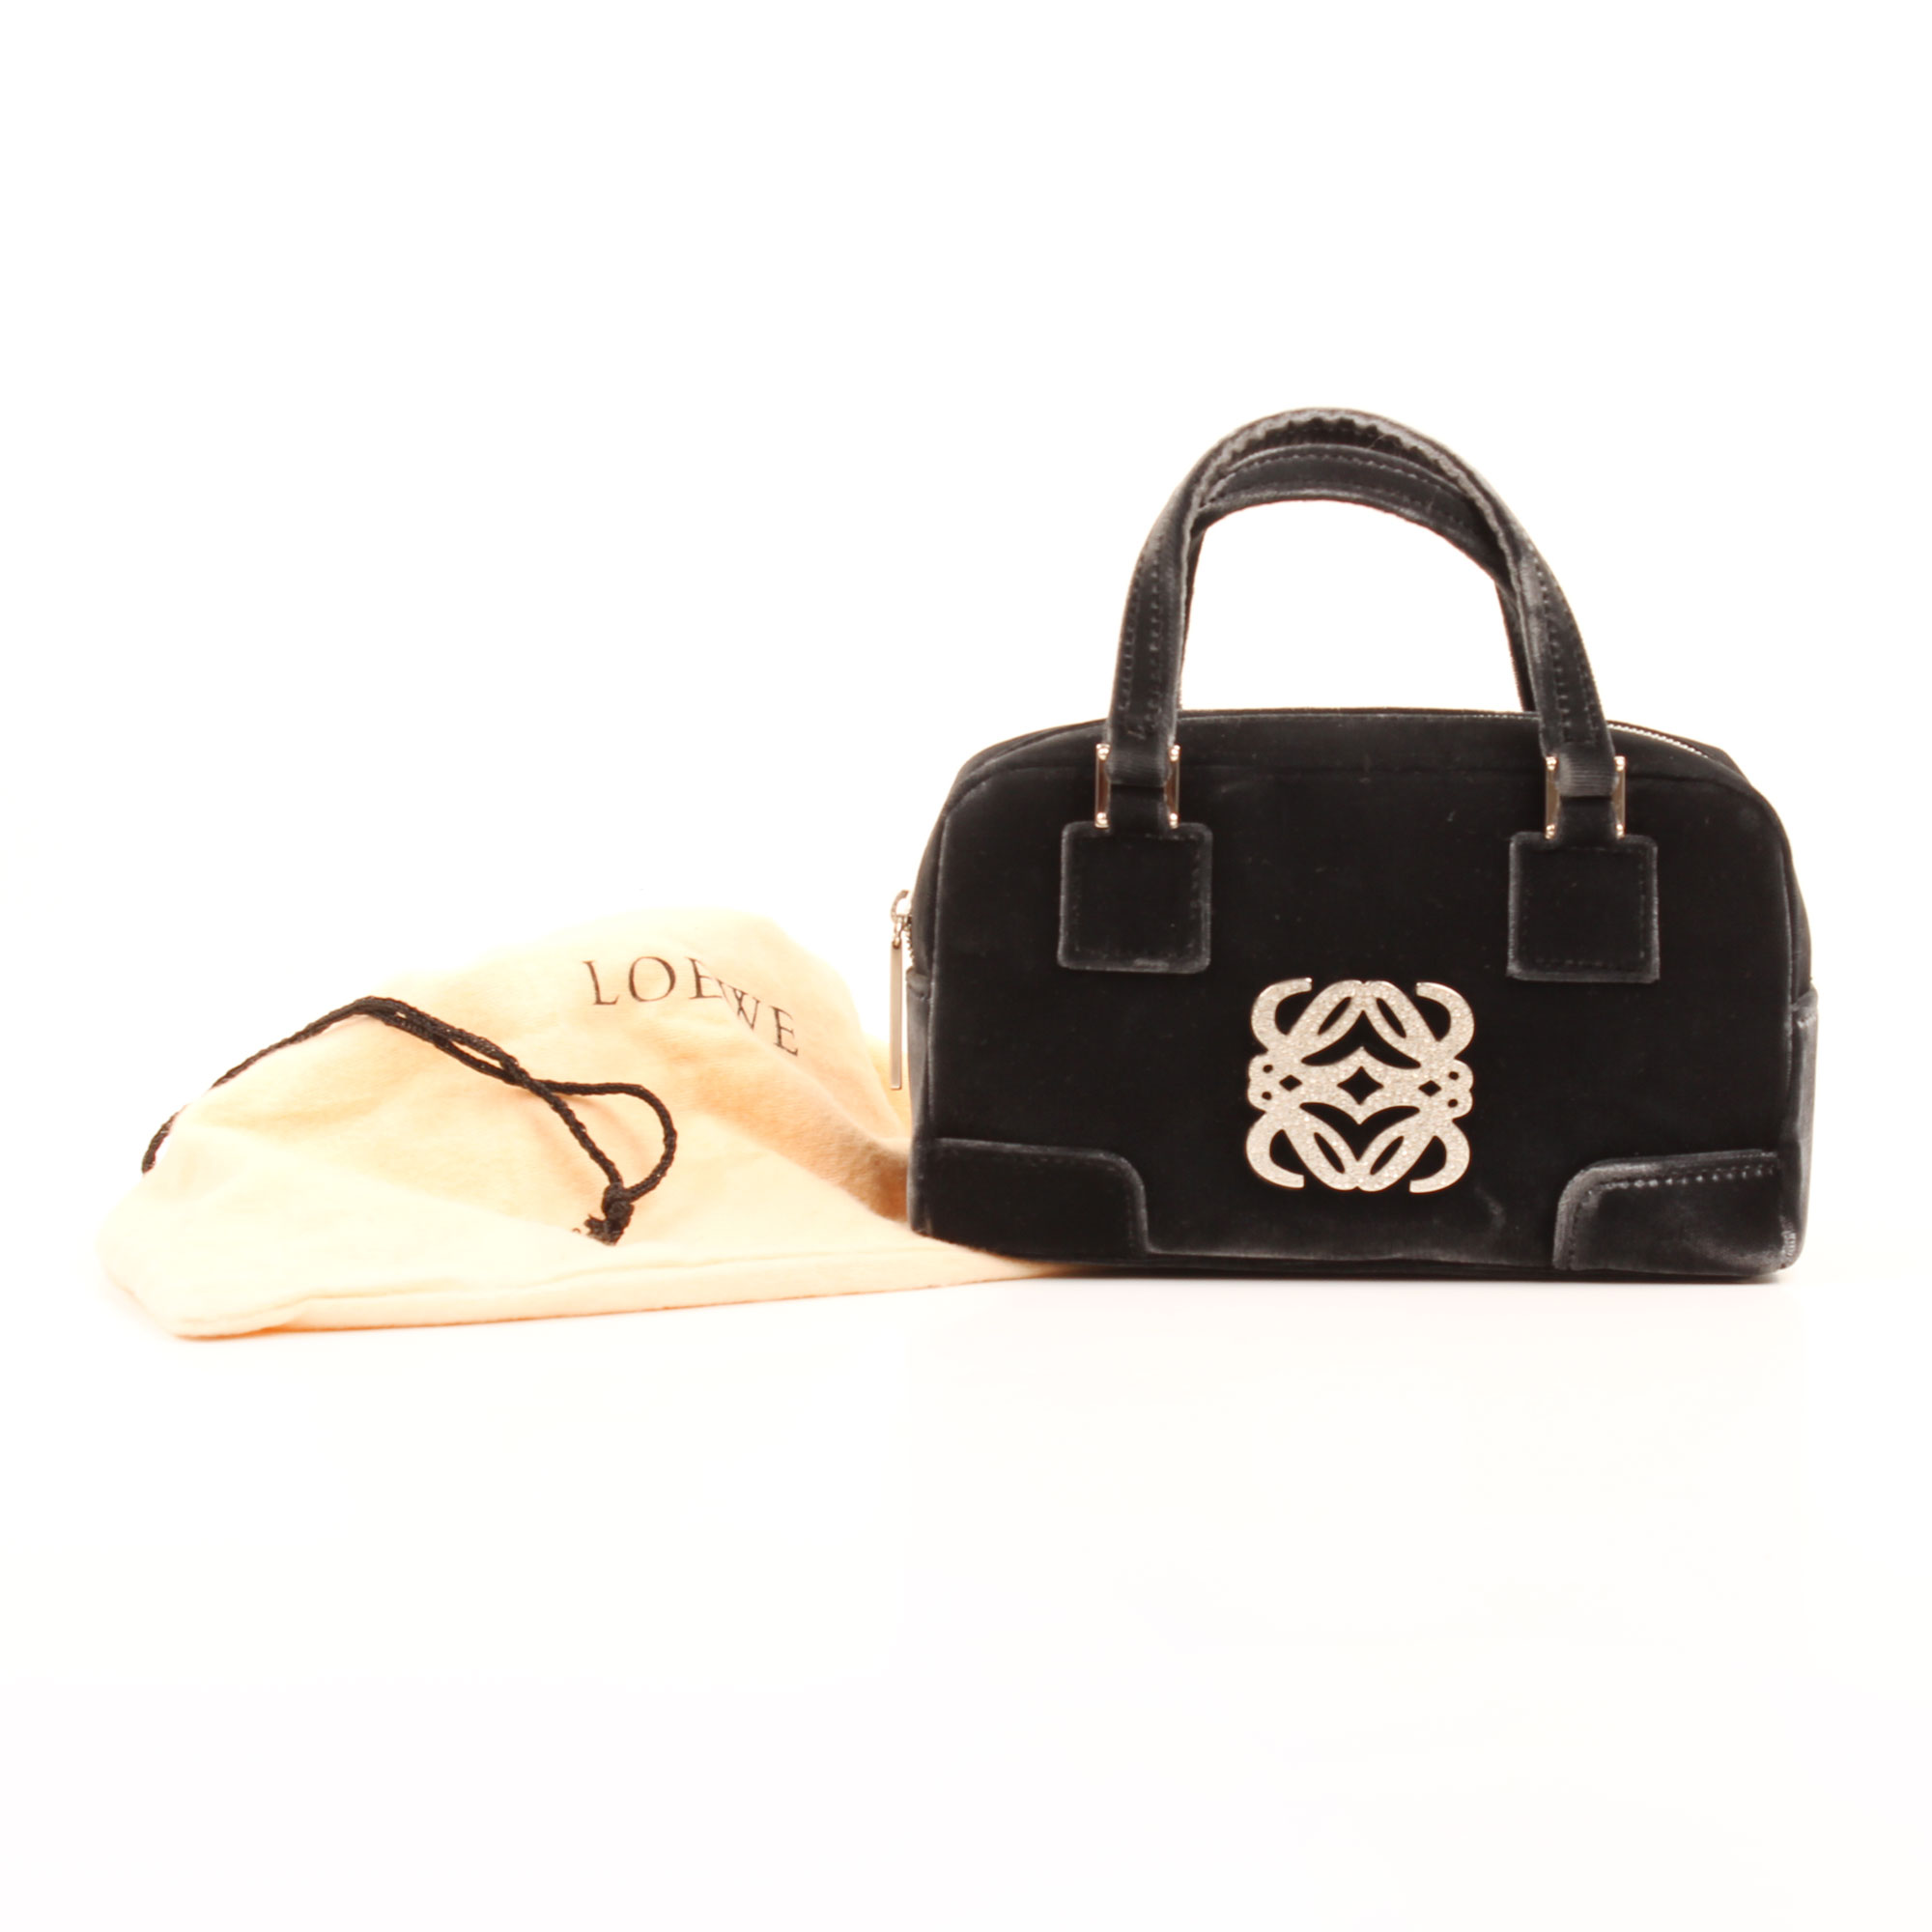 Imagen de la funda del bolso loewe amazona bb negro terciopelo